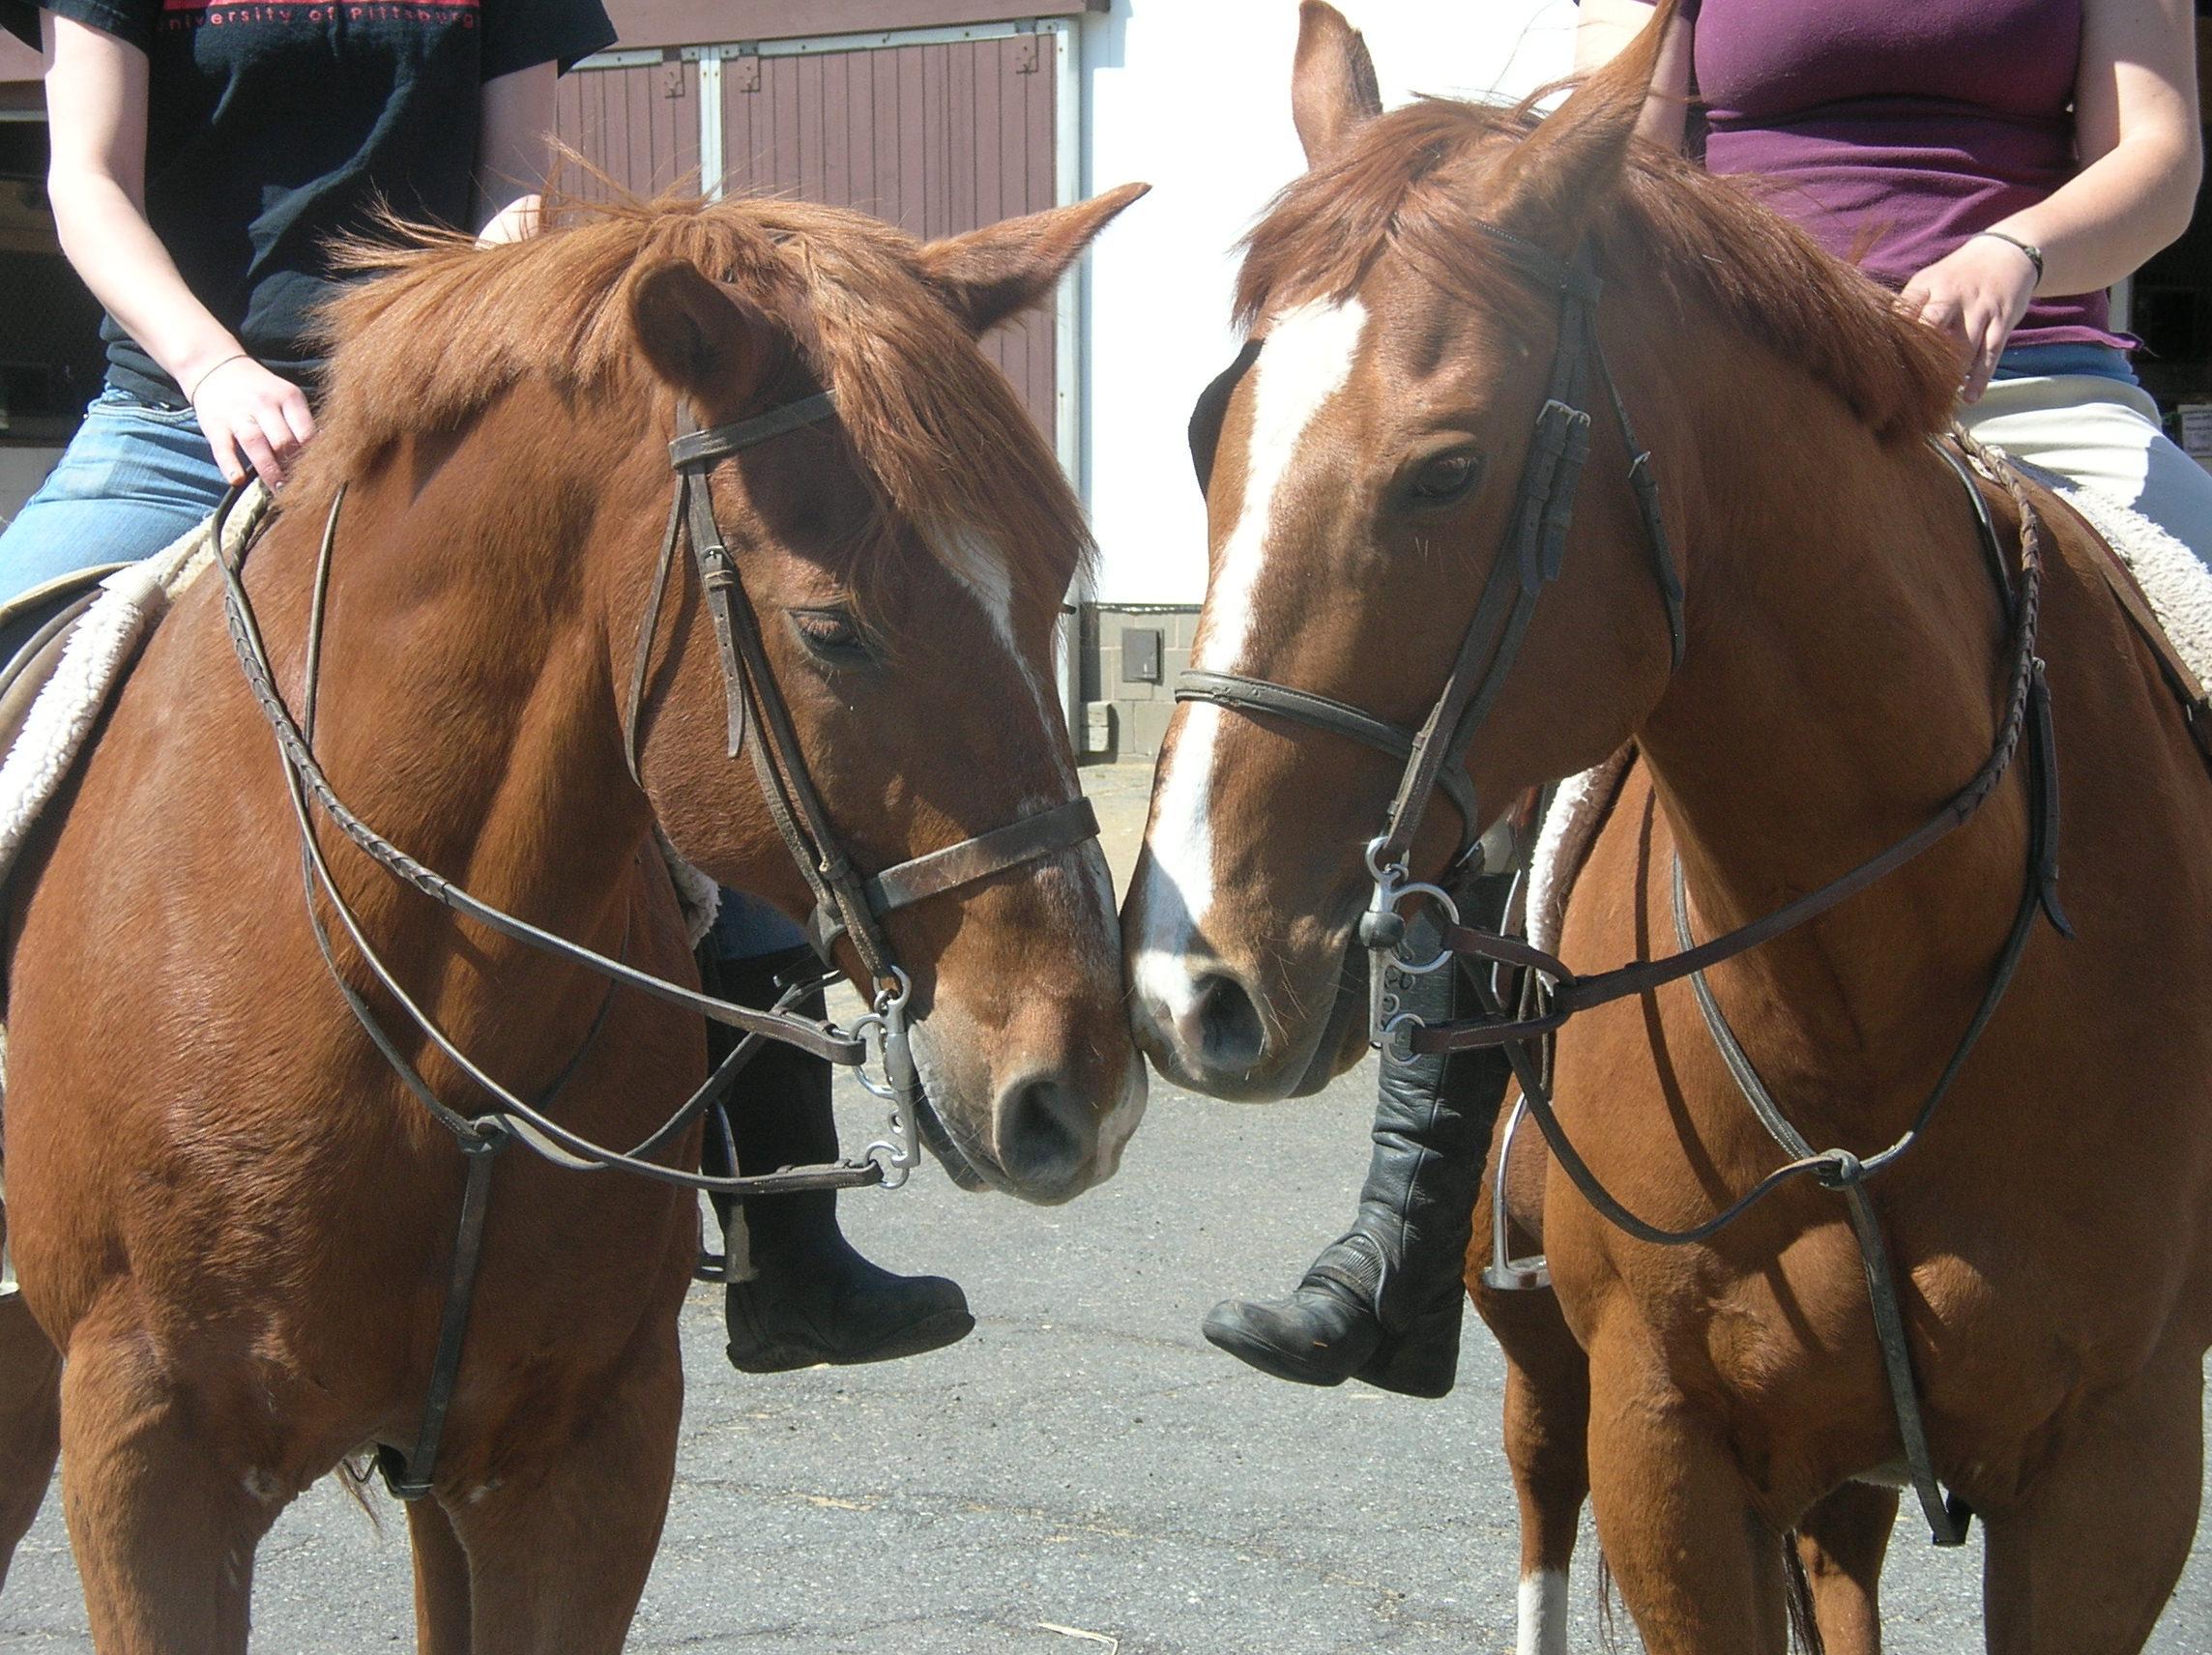 2f6a0cd50c1539fd5ddb_horses_1.JPG